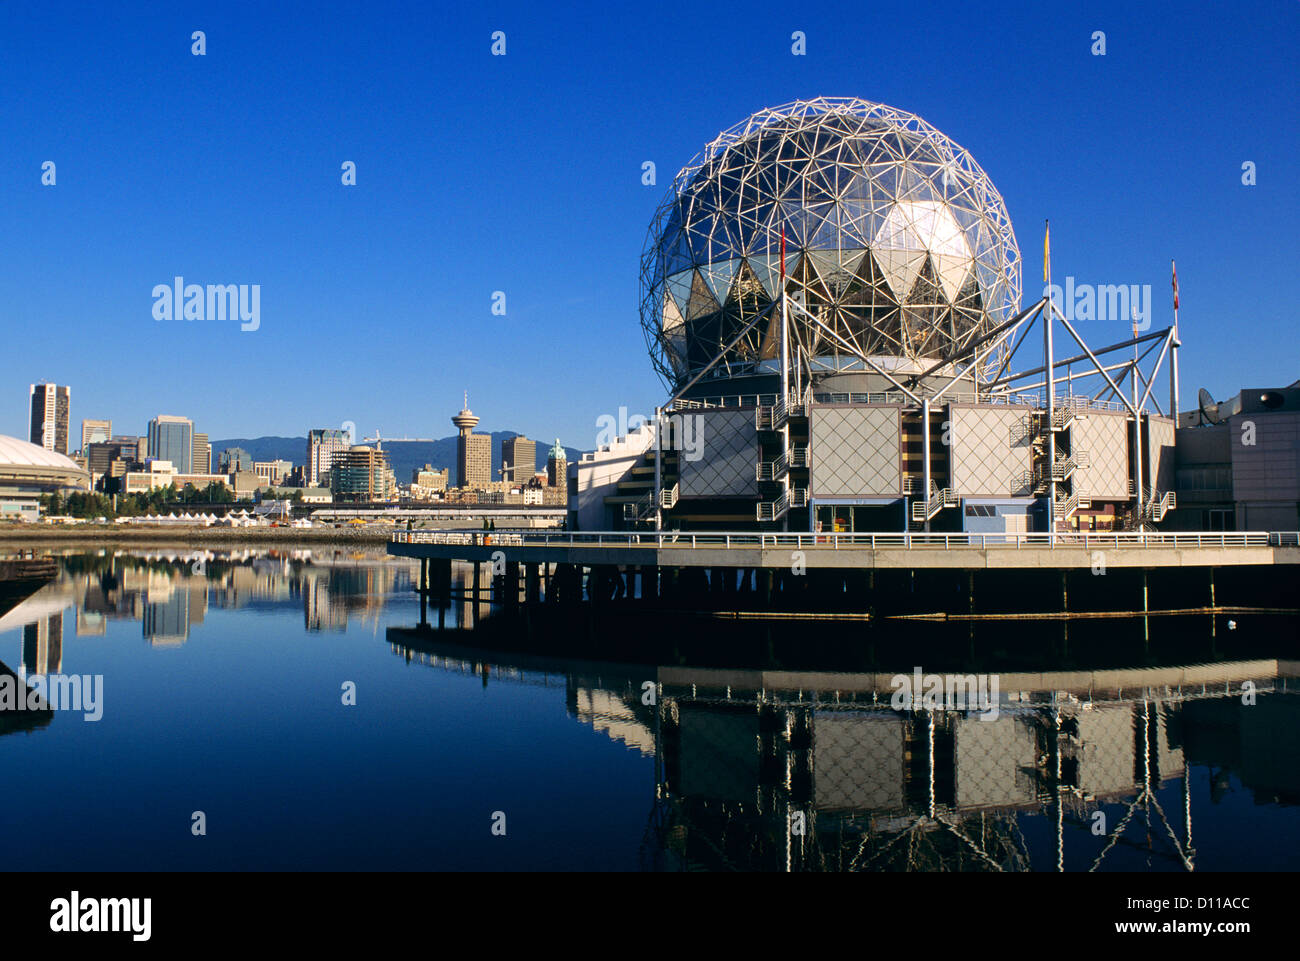 SCIENCE WORLD OF BRITISH COLUMBIA VANCOUVER BRITISH ...